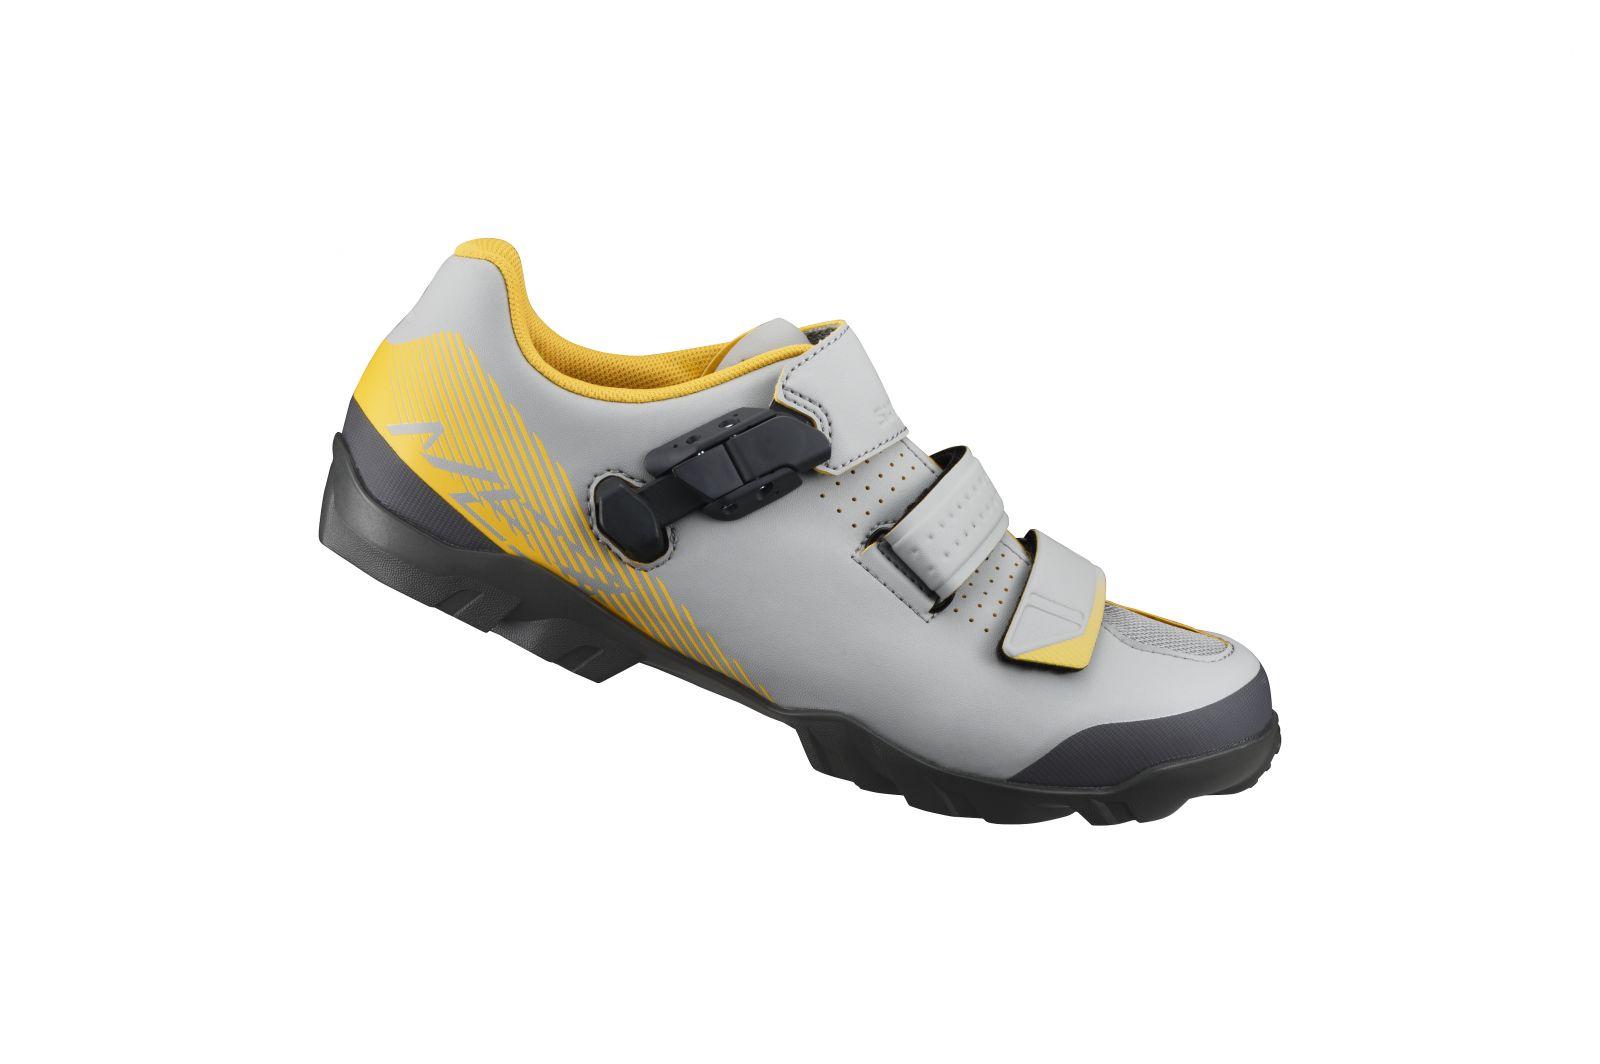 SHIMANO MTB obuv SH-ME300MG, šedá žlutá, 47